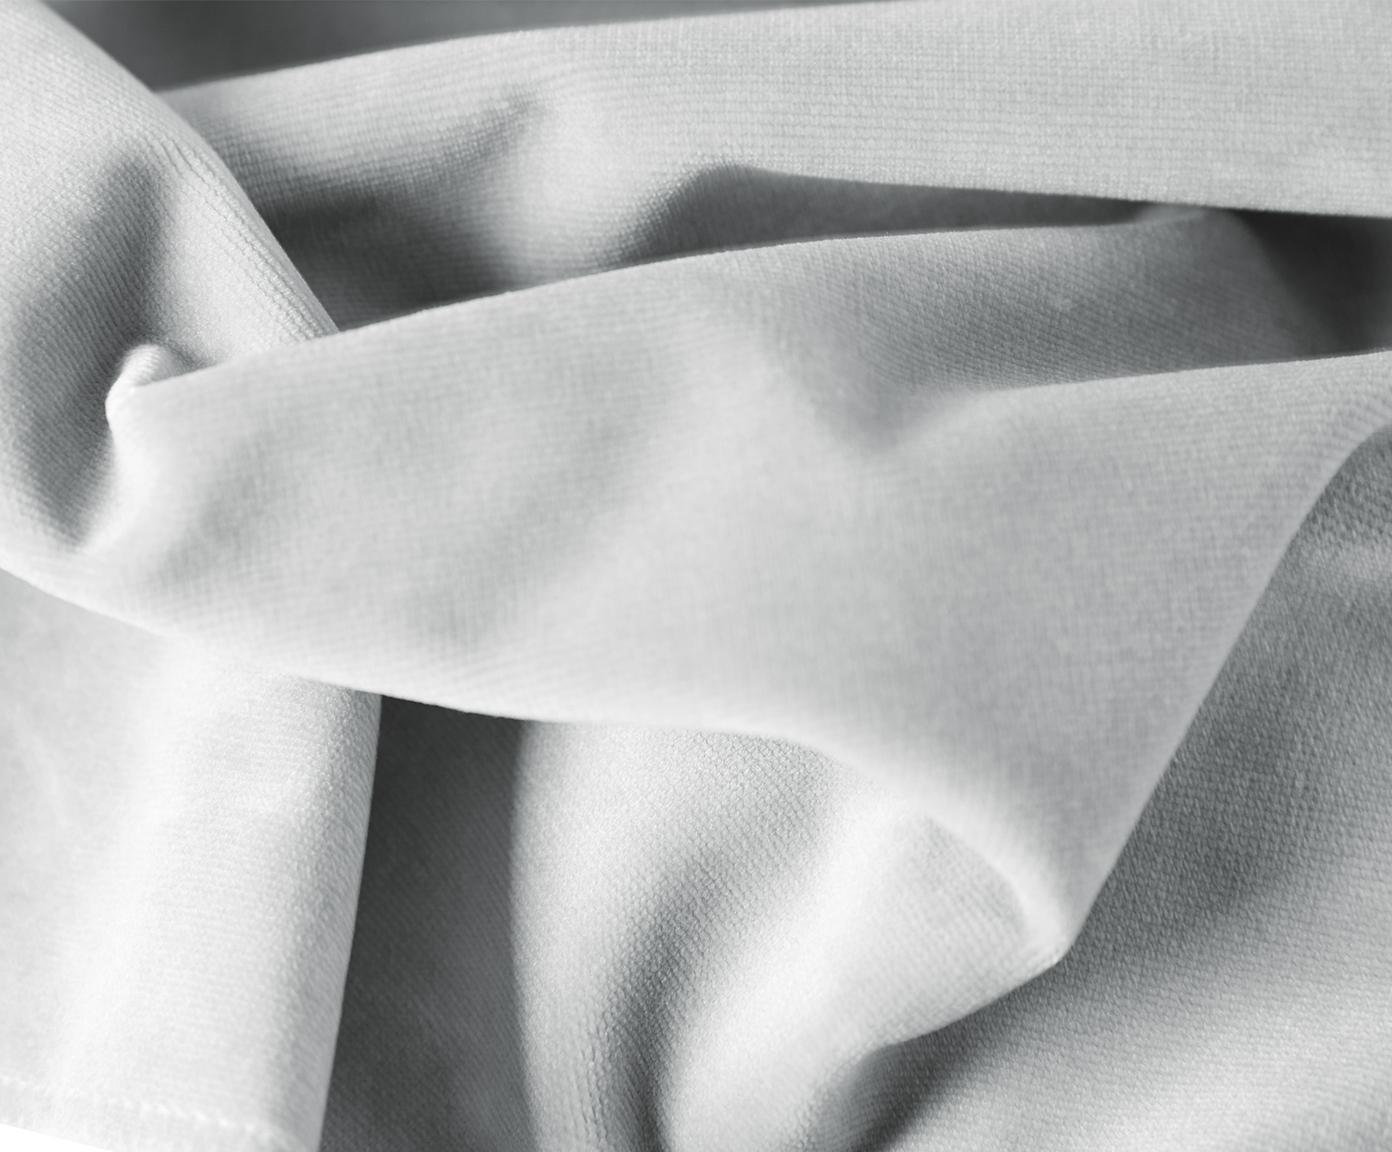 Samt-Ottomane Fluente, Bezug: Samt (Hochwertiger Polyes, Gestell: Massives Kiefernholz, Füße: Metall, lackiert, Samt Hellgrau, B 201 x T 83 cm